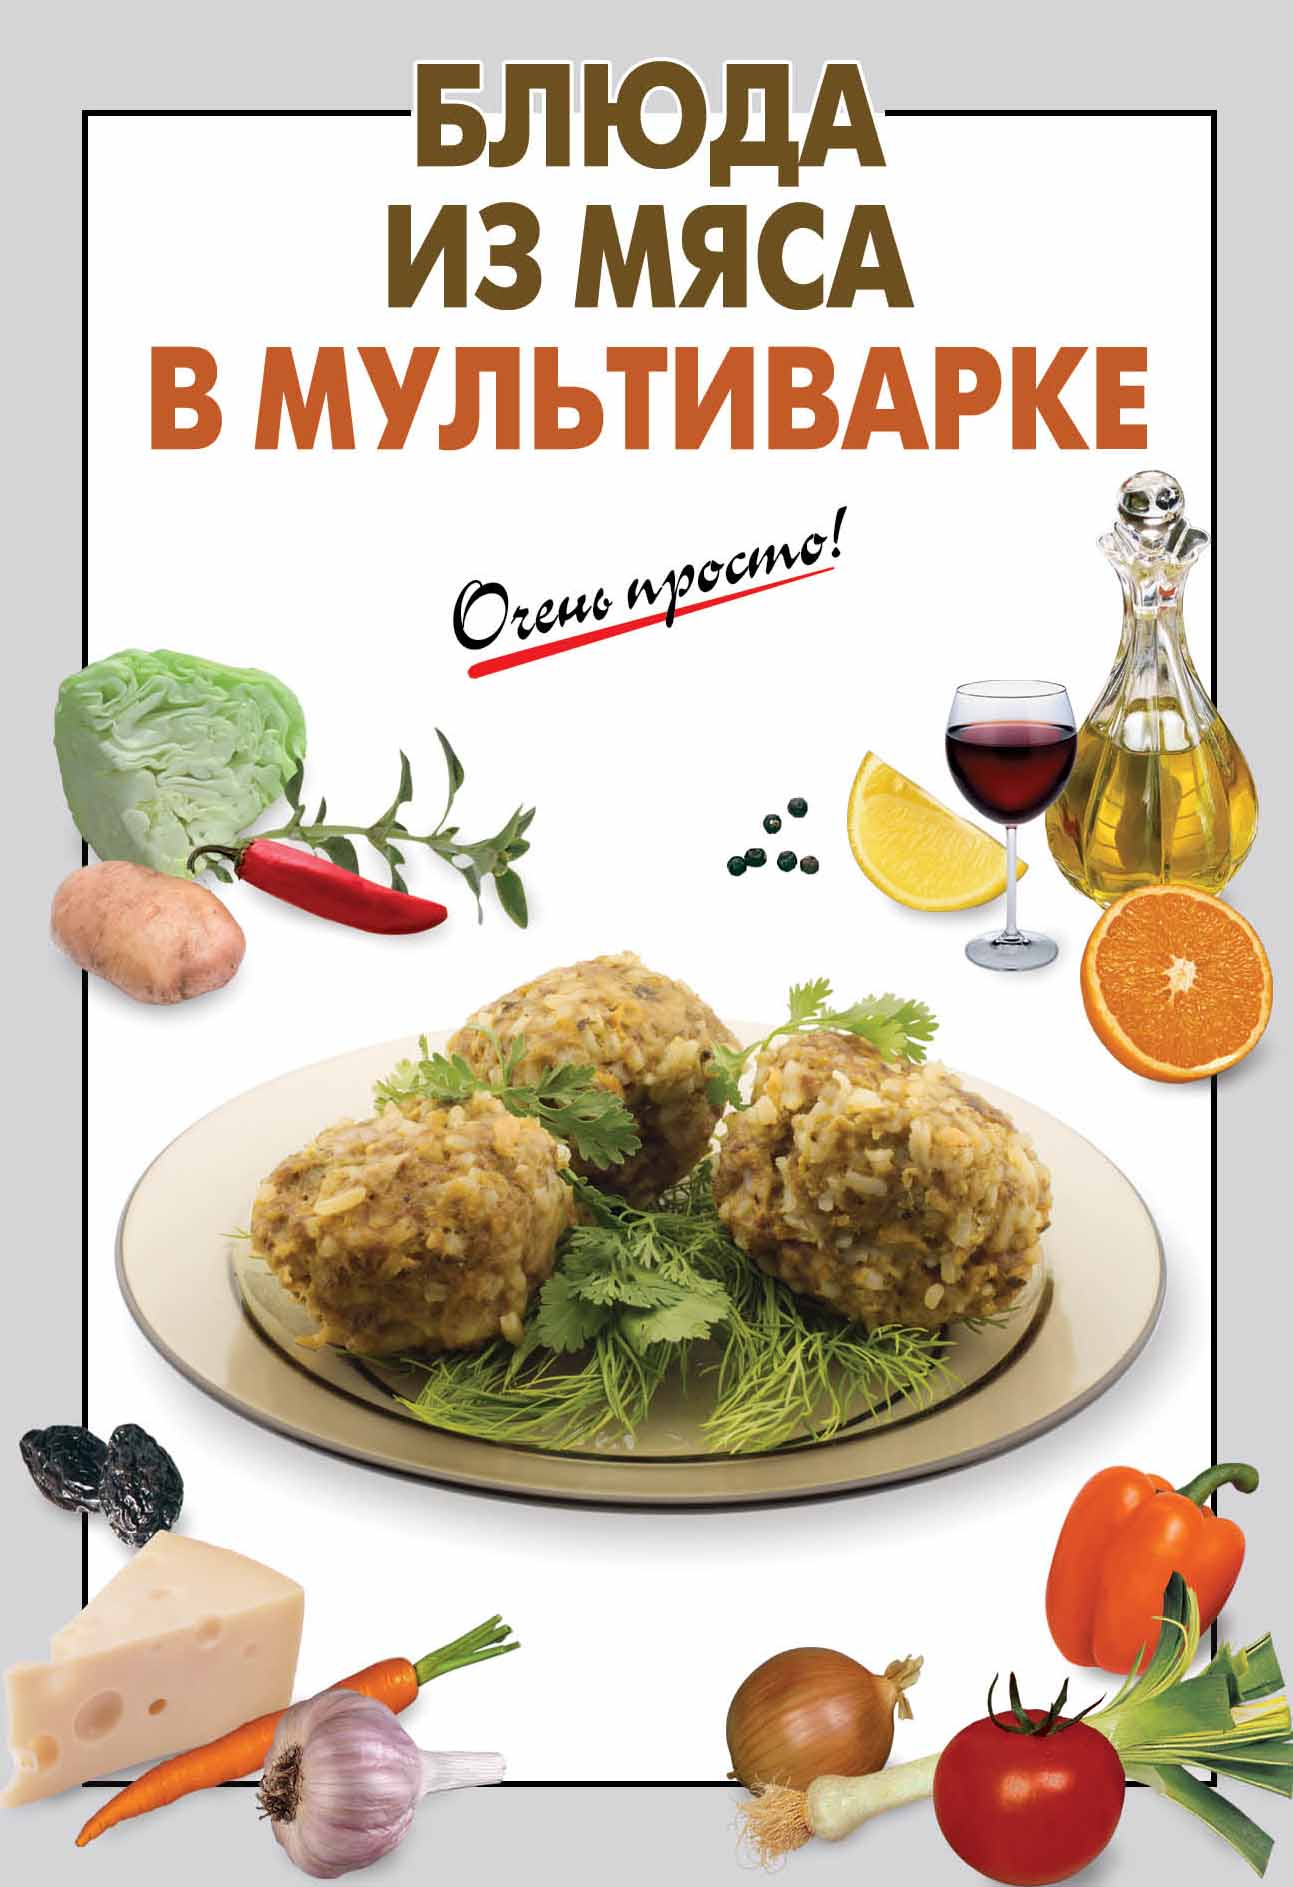 Кулинария из мясо рецепты